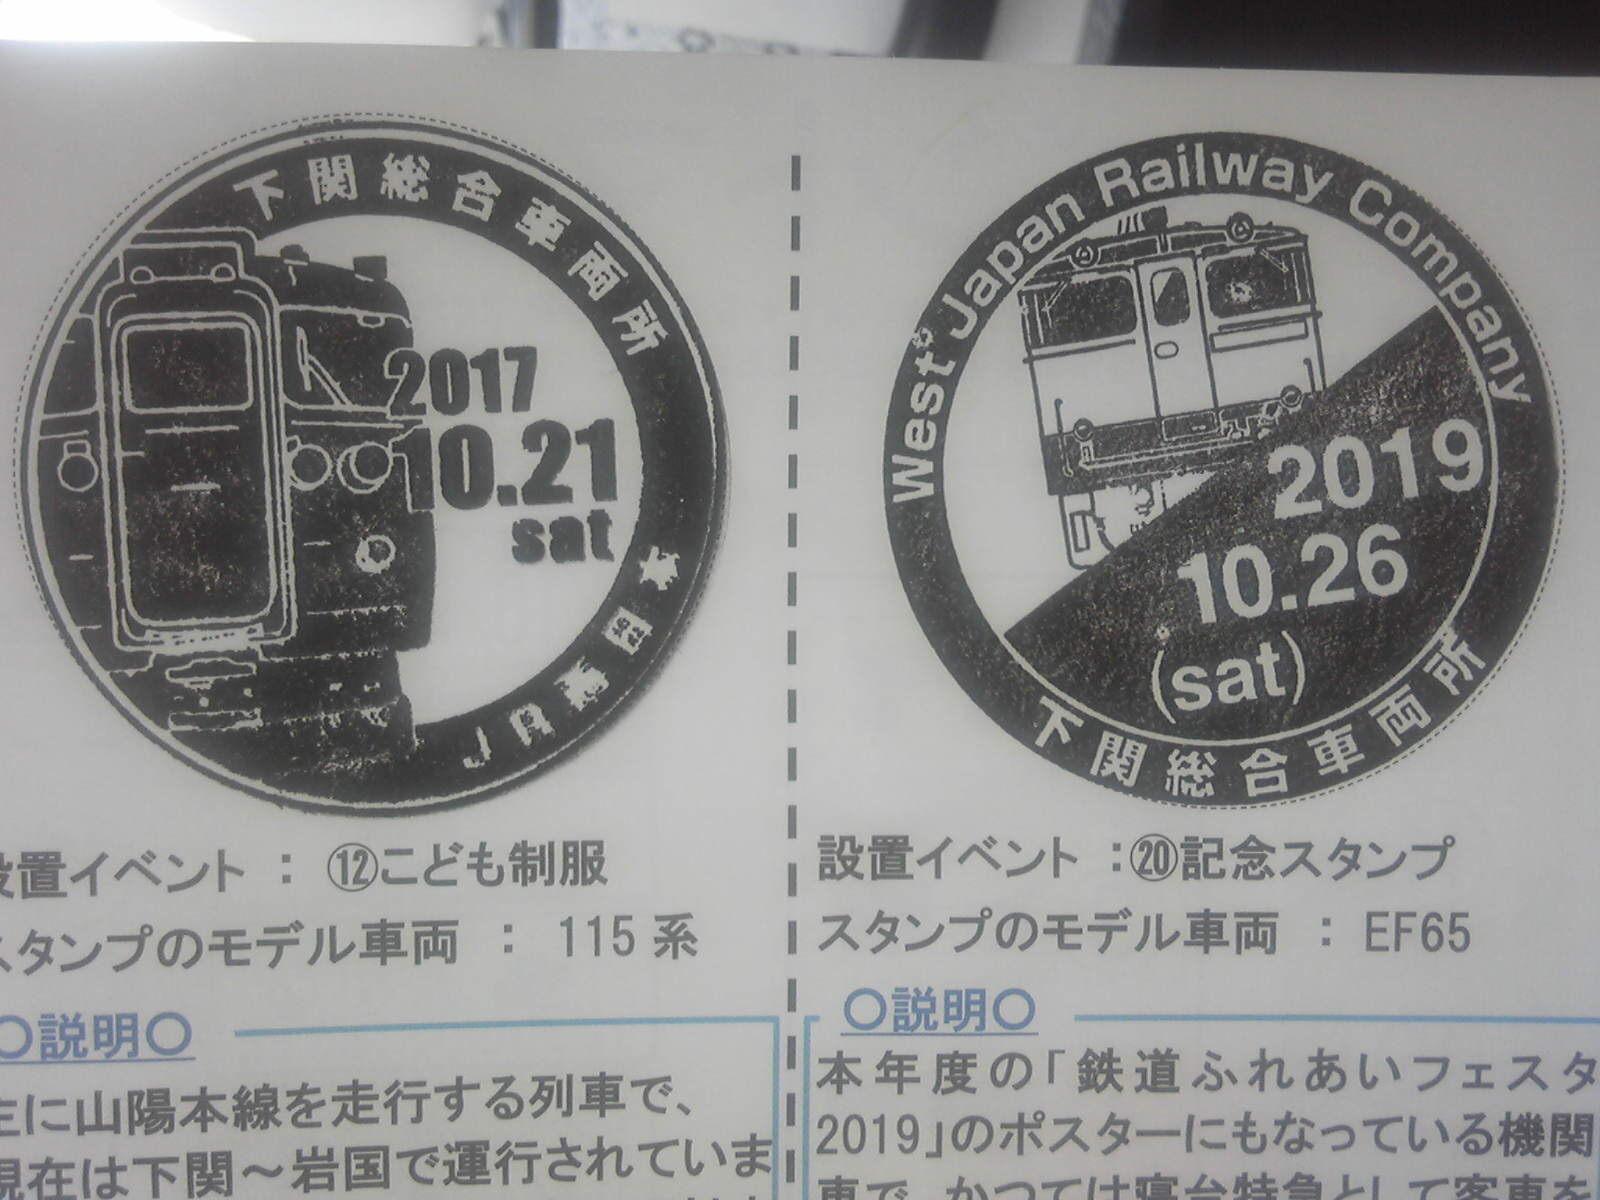 単独表示 SBSH0243.JPG